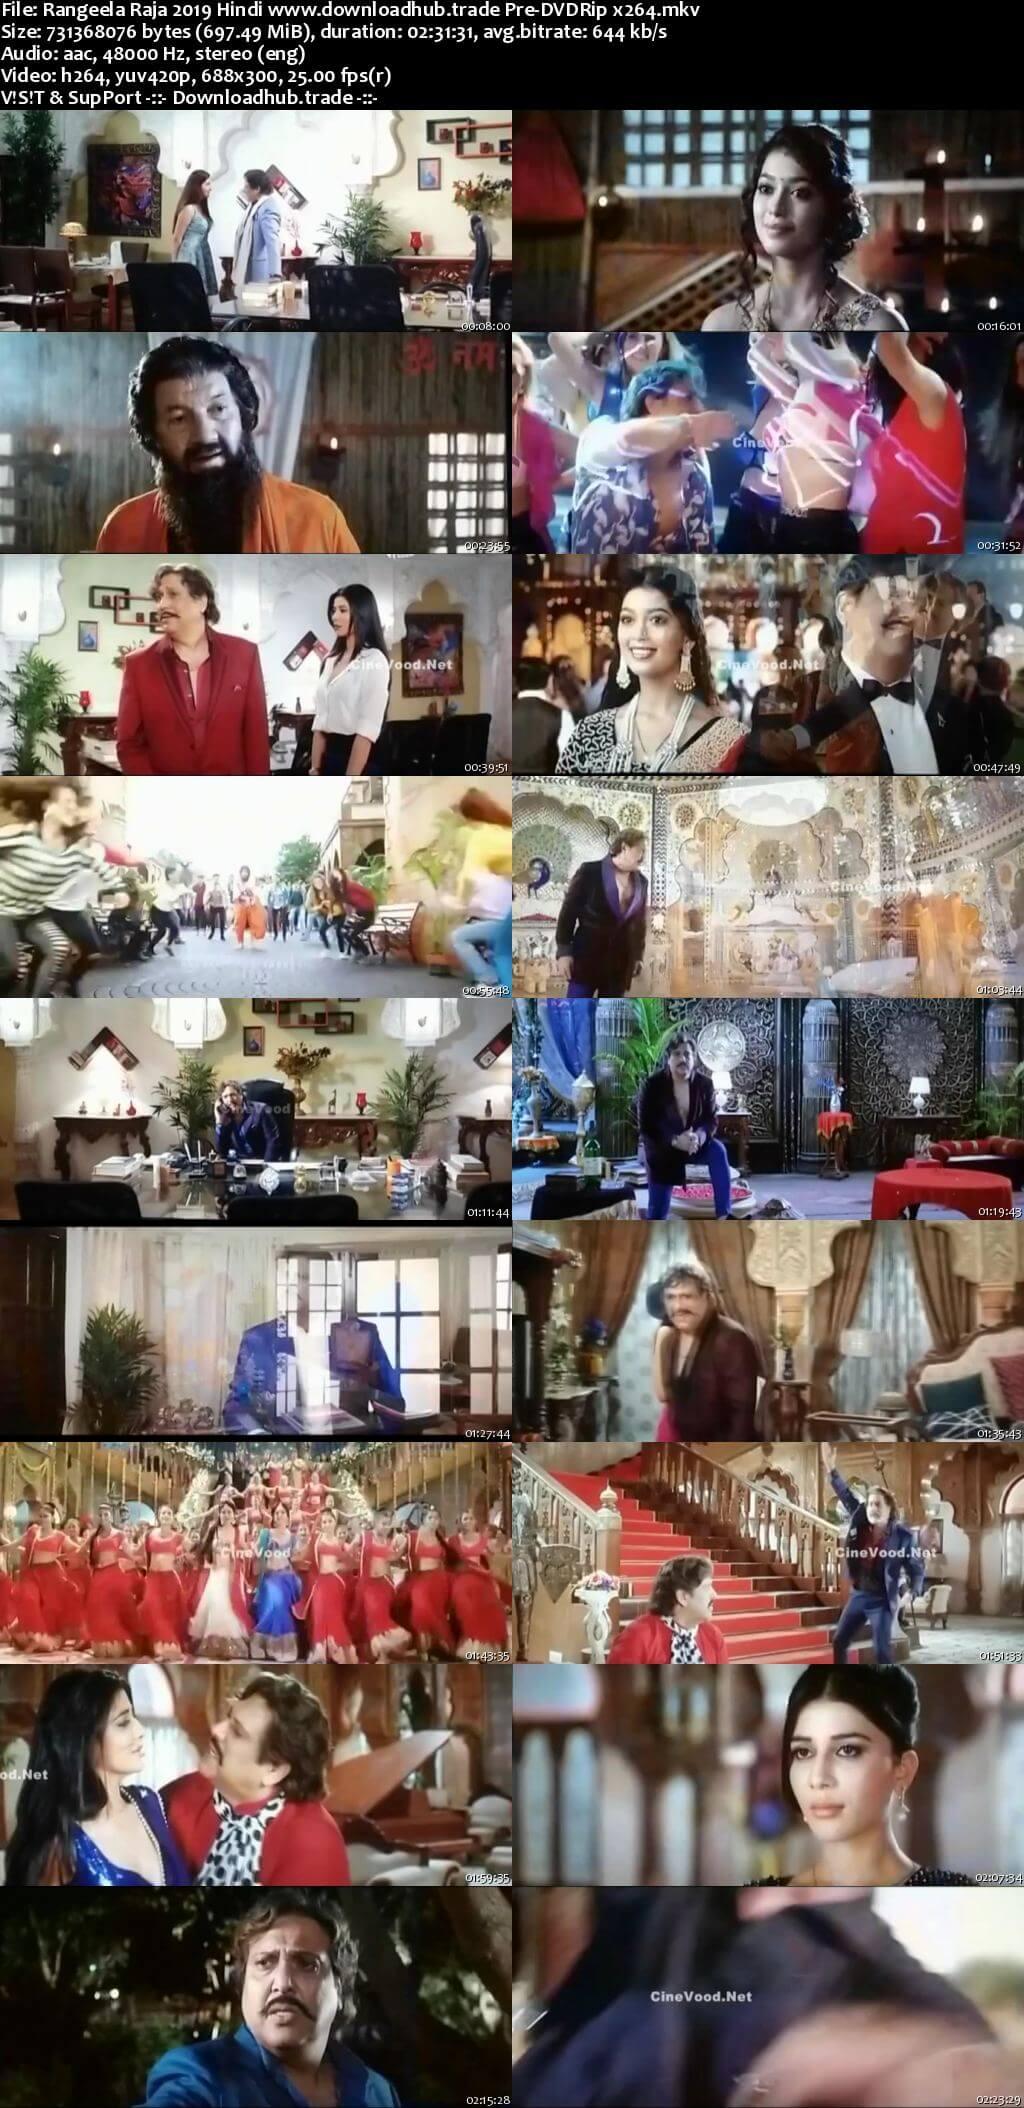 Rangeela Raja 2019 Hindi 700MB Pre-DVDRip x264